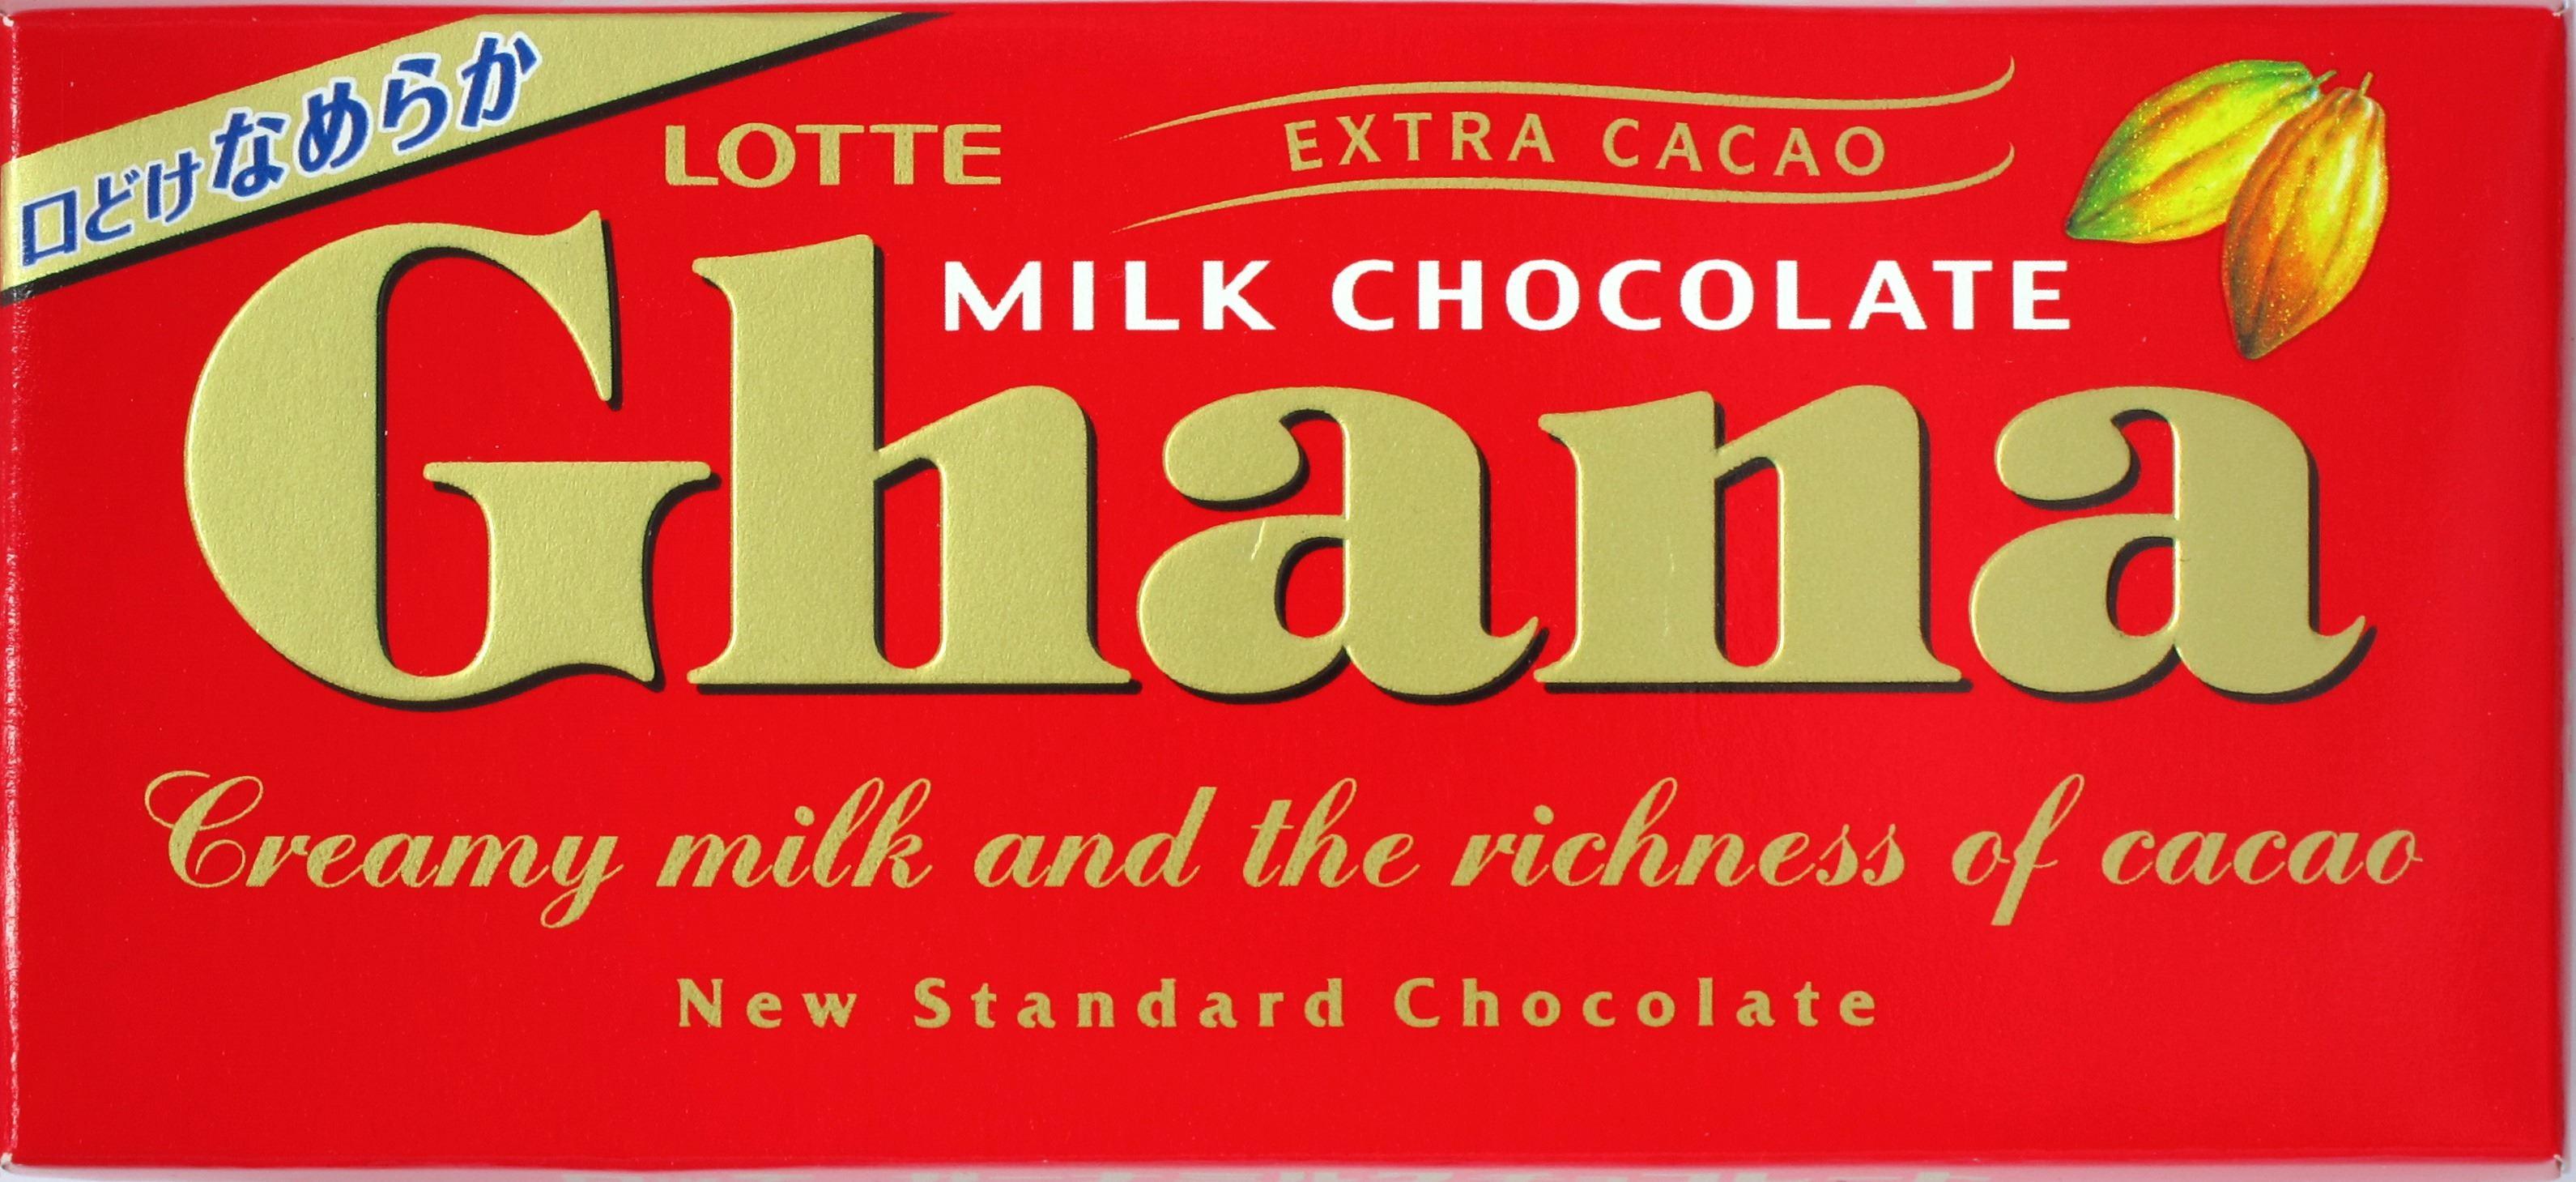 "Packung japanisch-koreanische Milchschokolade Lotte ""Ghana"""